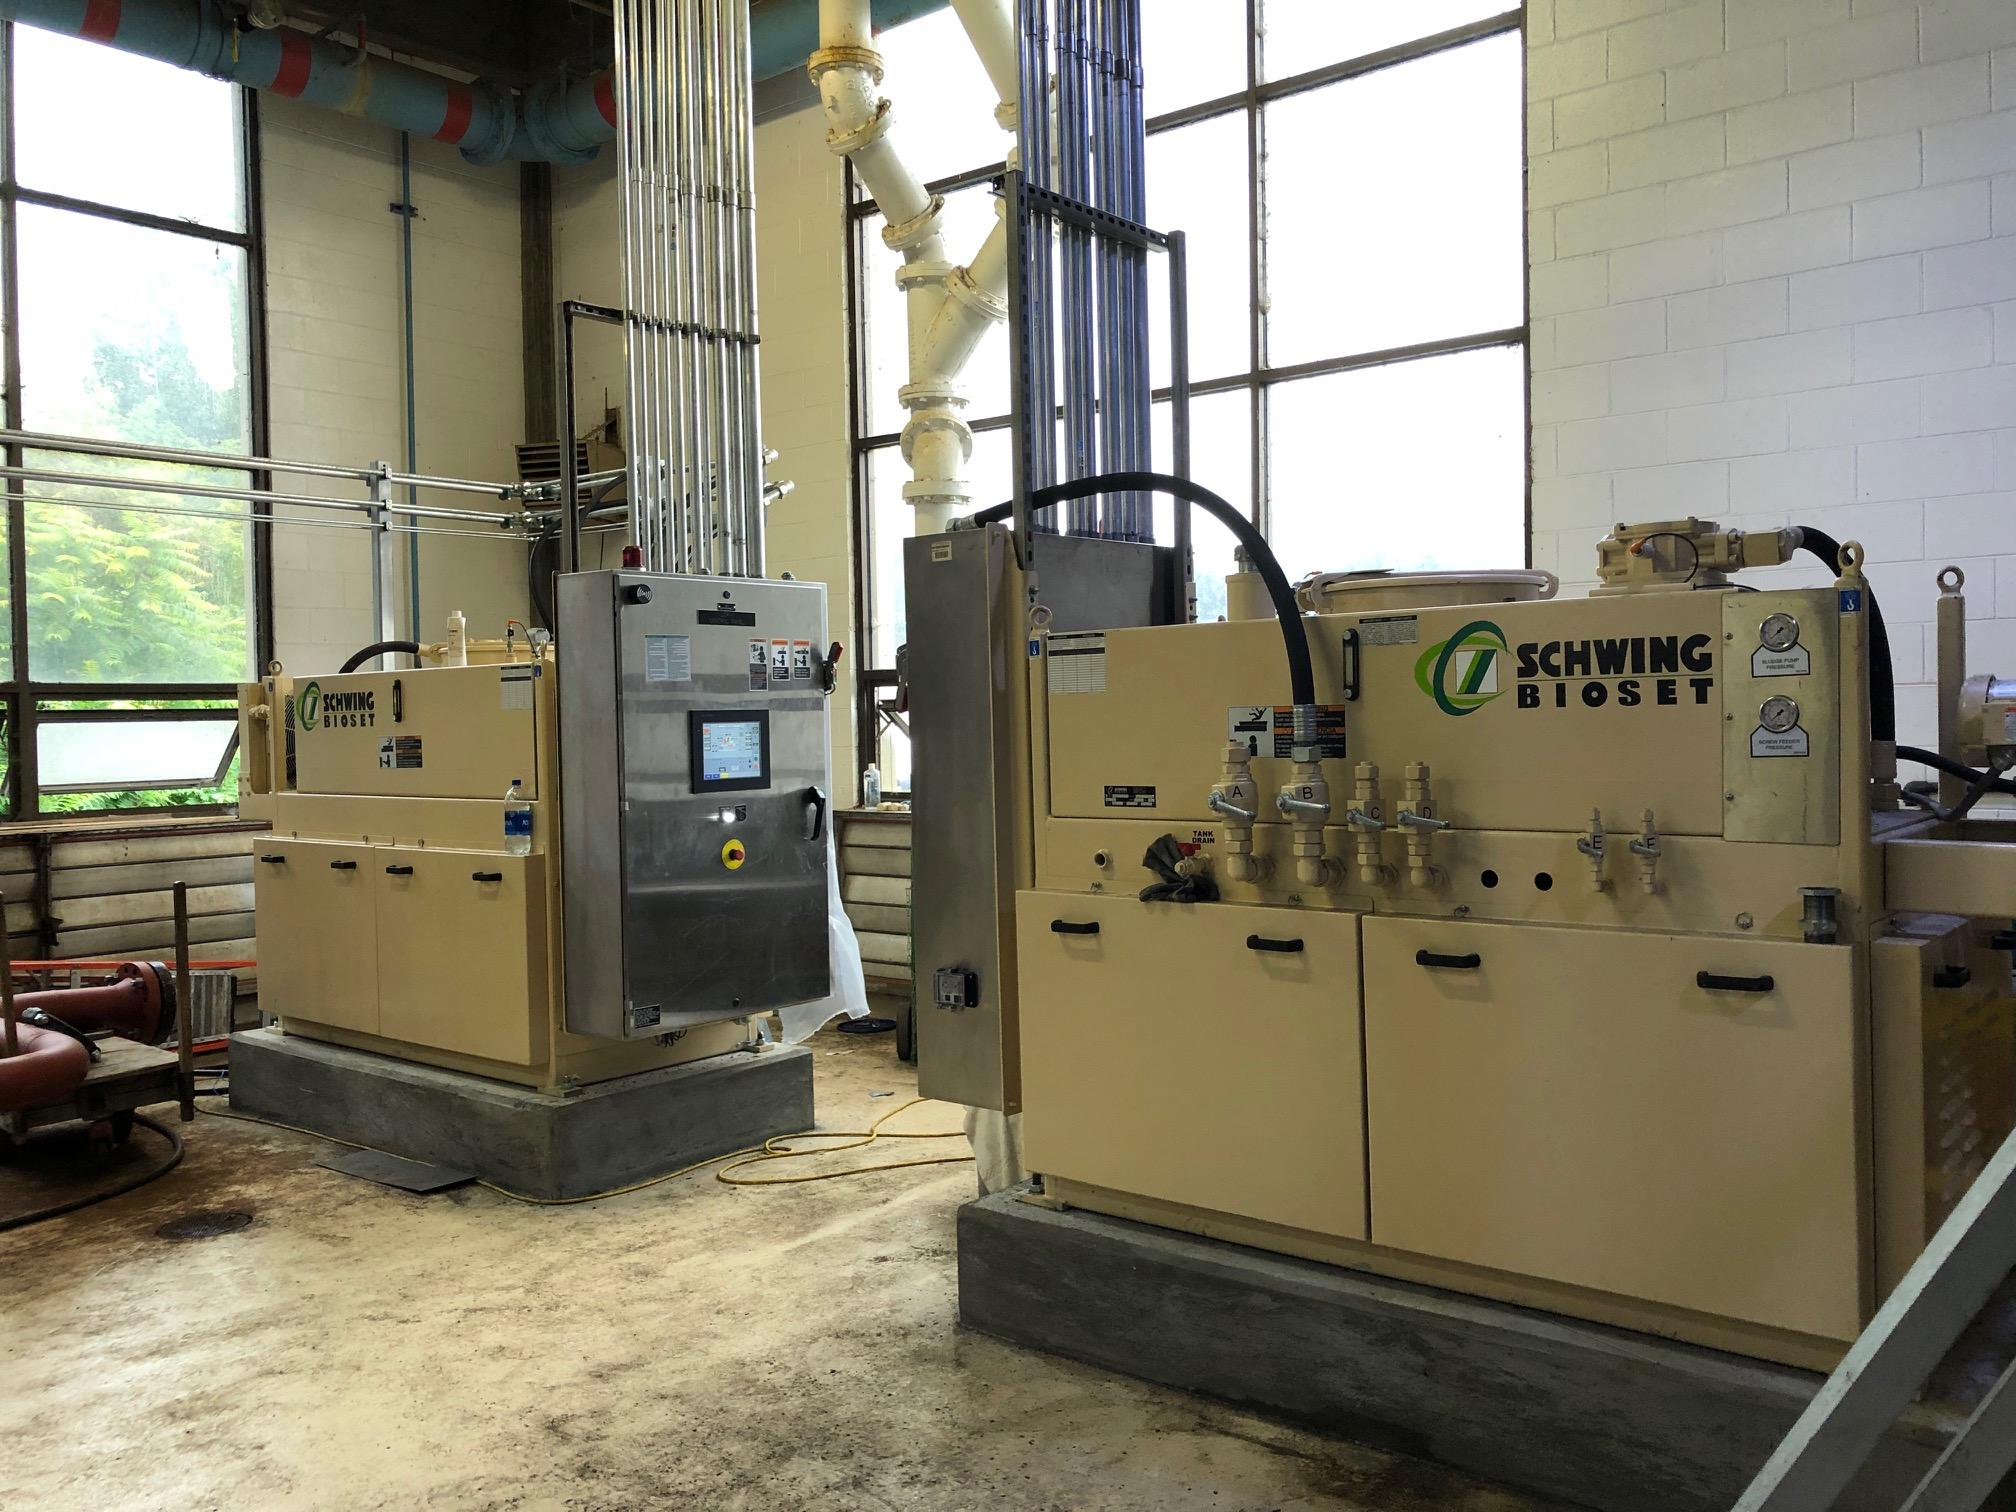 Schwing Bioset Power Pack